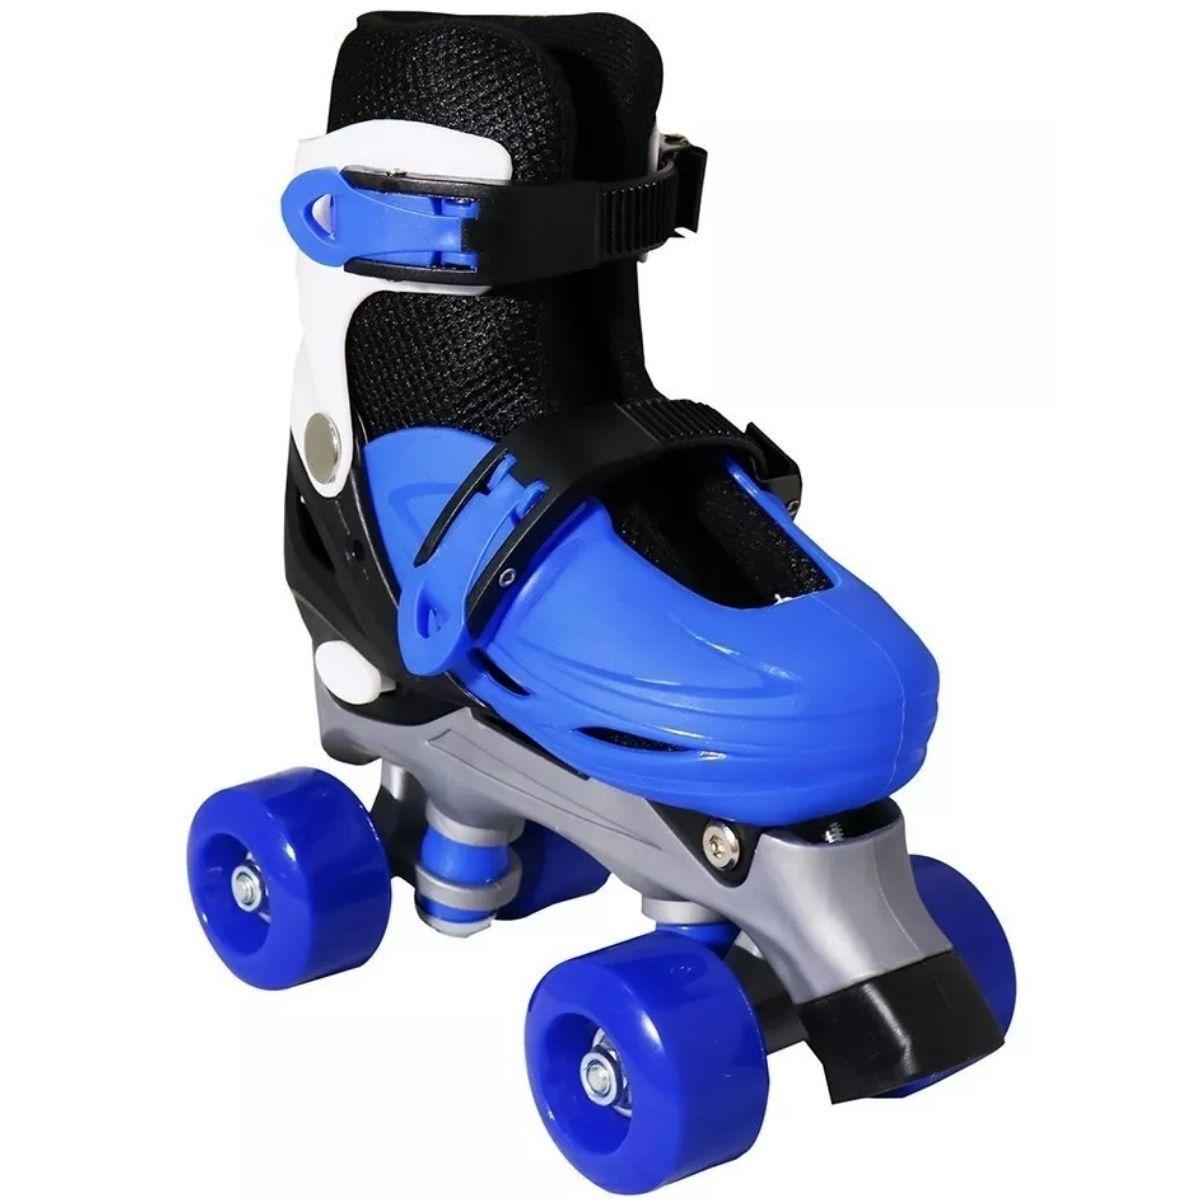 Kit Patins Infantil Azul 4 Rodas + Capacete + Joelheira + Cotoveleira - BW-016-AZ+CP02